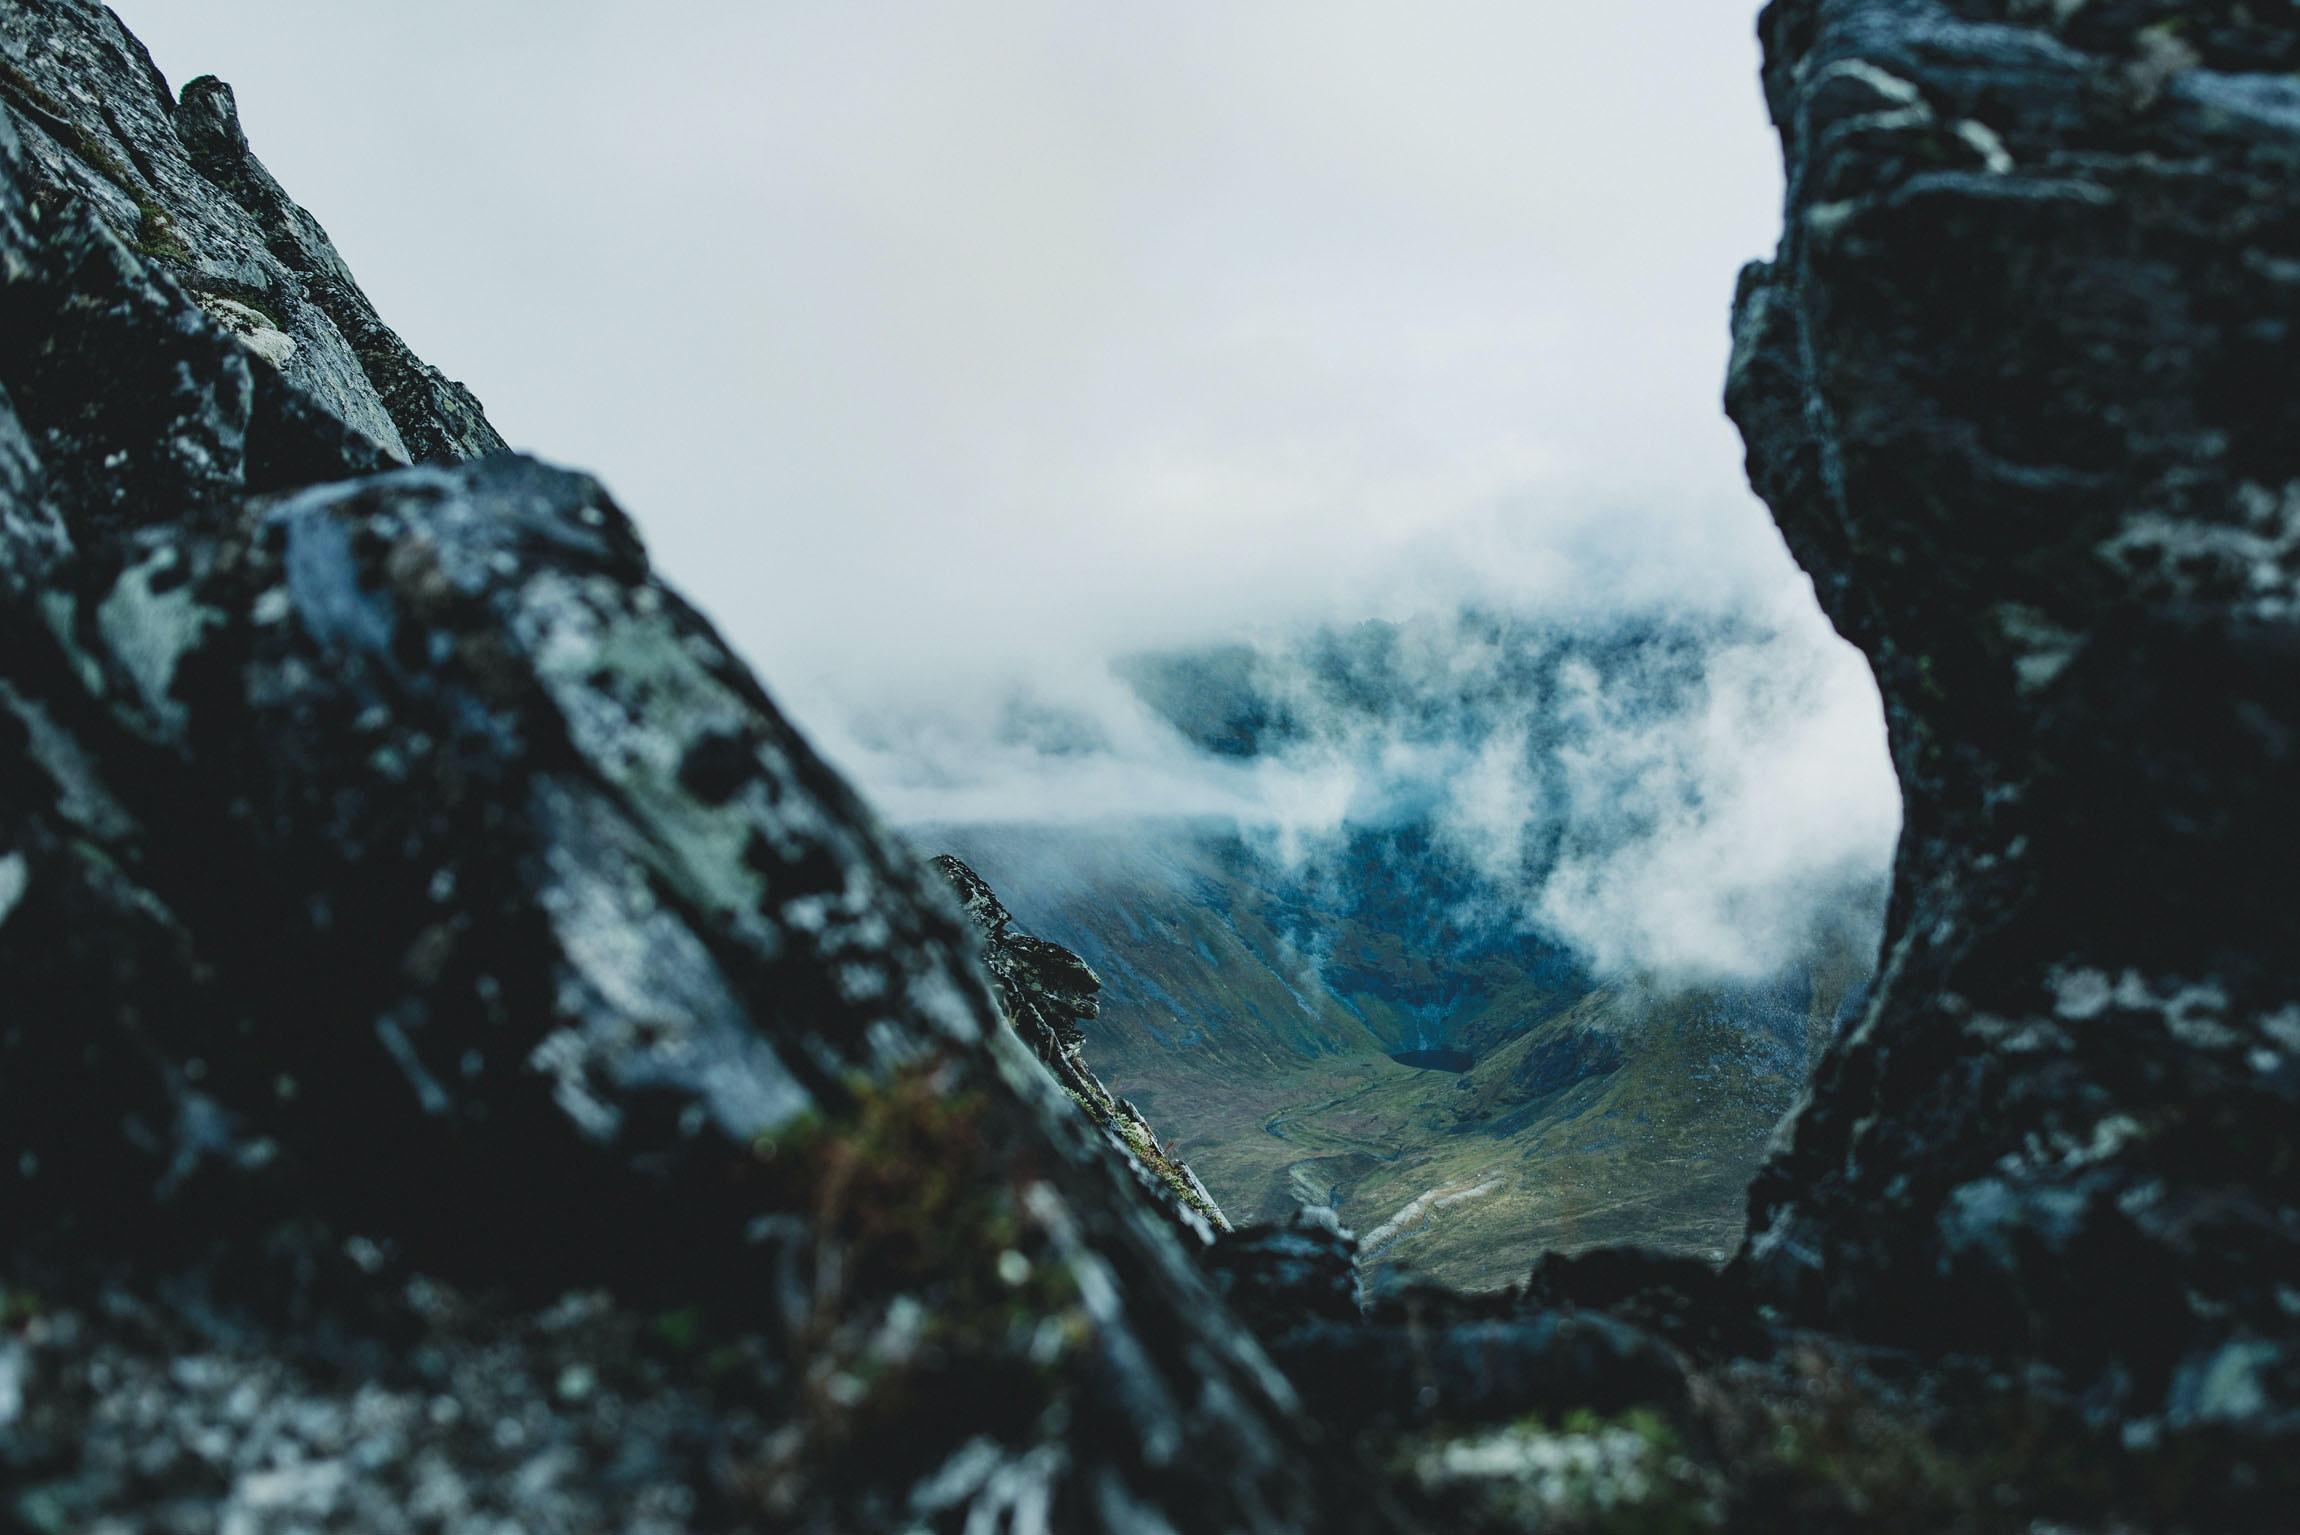 Peeking through mountains at a misty valley below